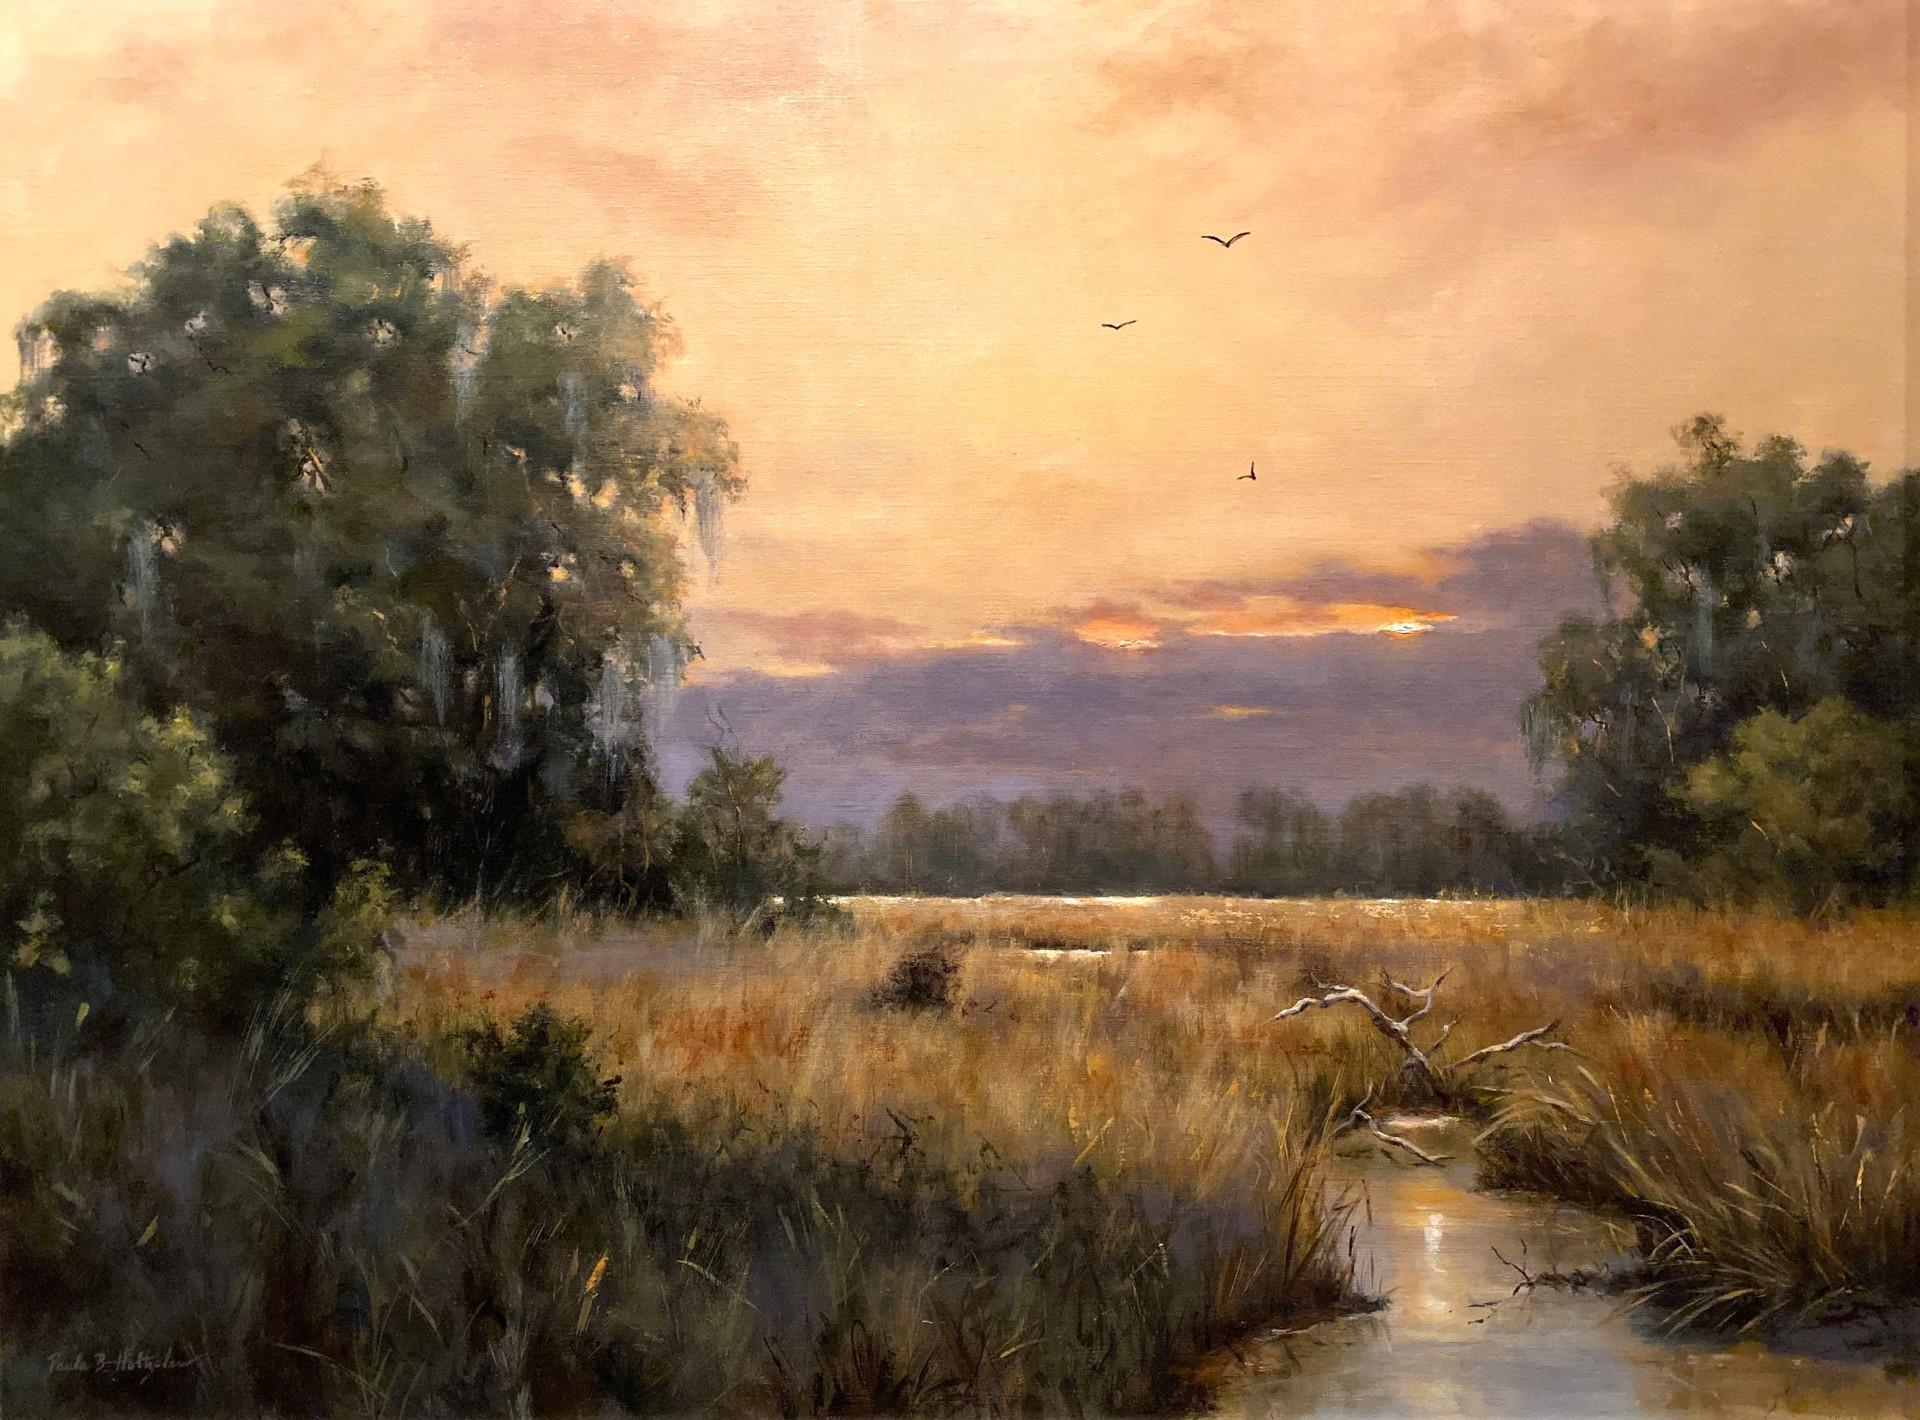 In Silence by Paula Holtzclaw, opa